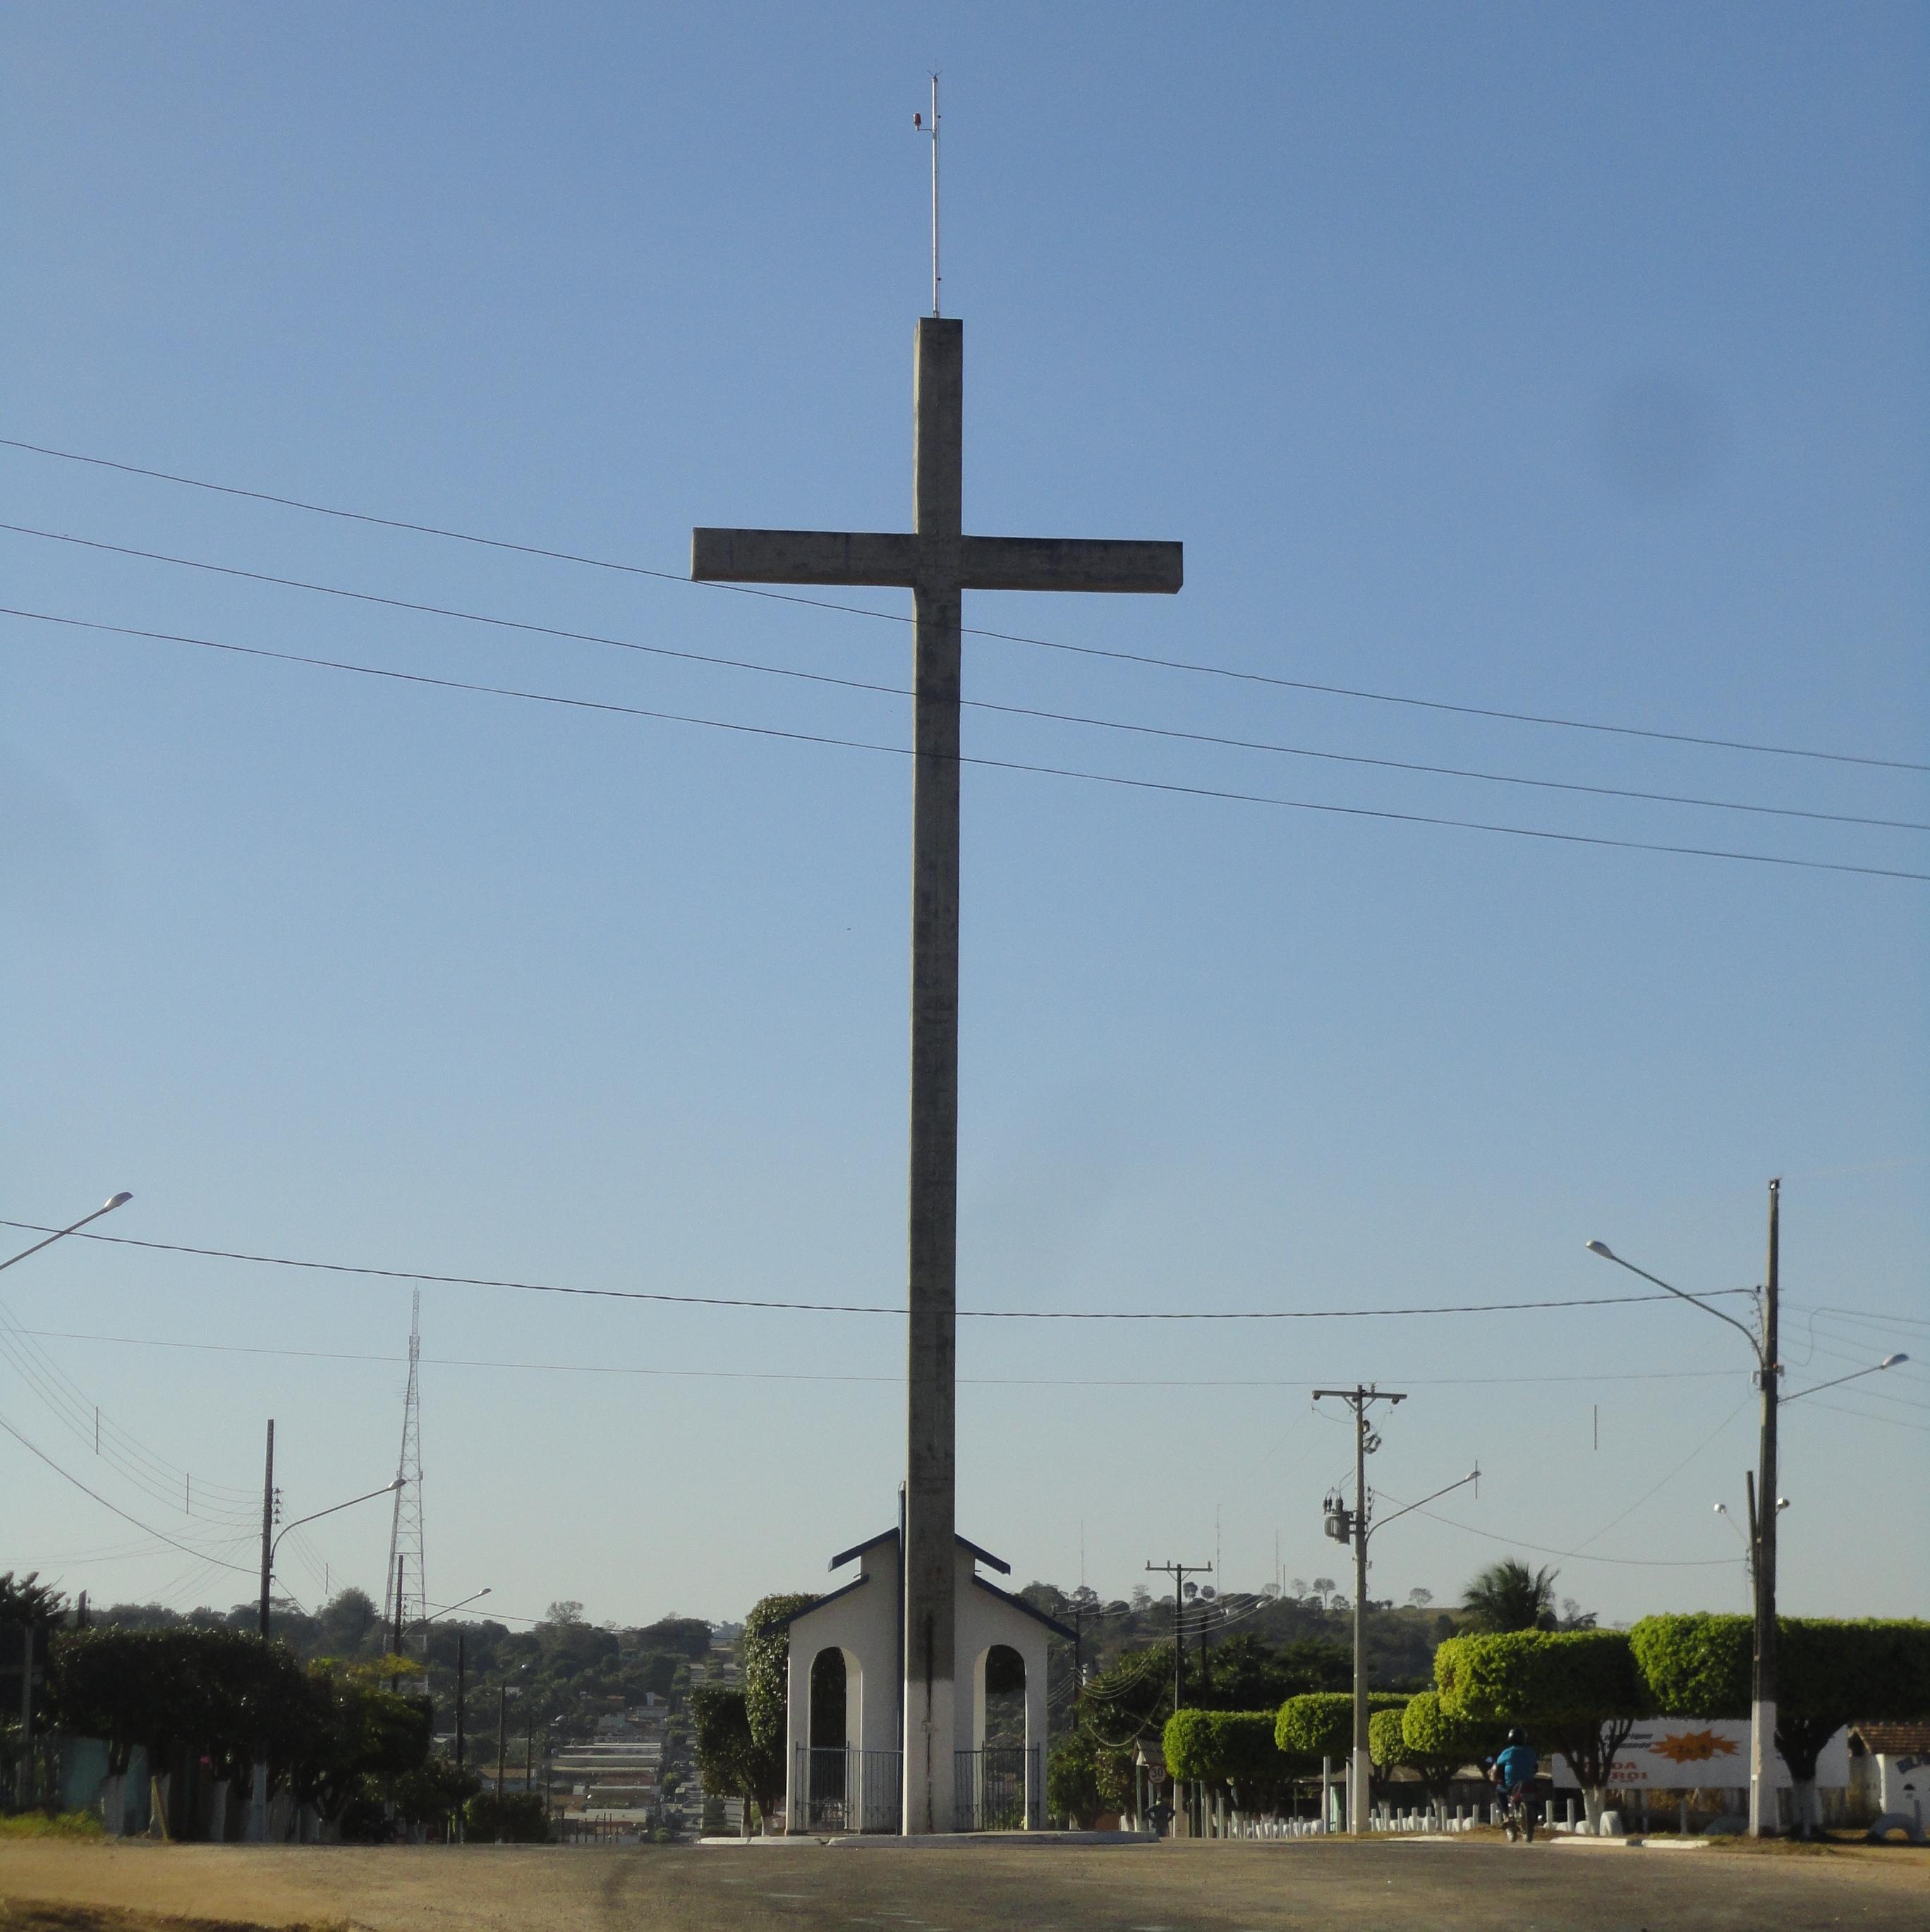 Jauru Mato Grosso fonte: upload.wikimedia.org